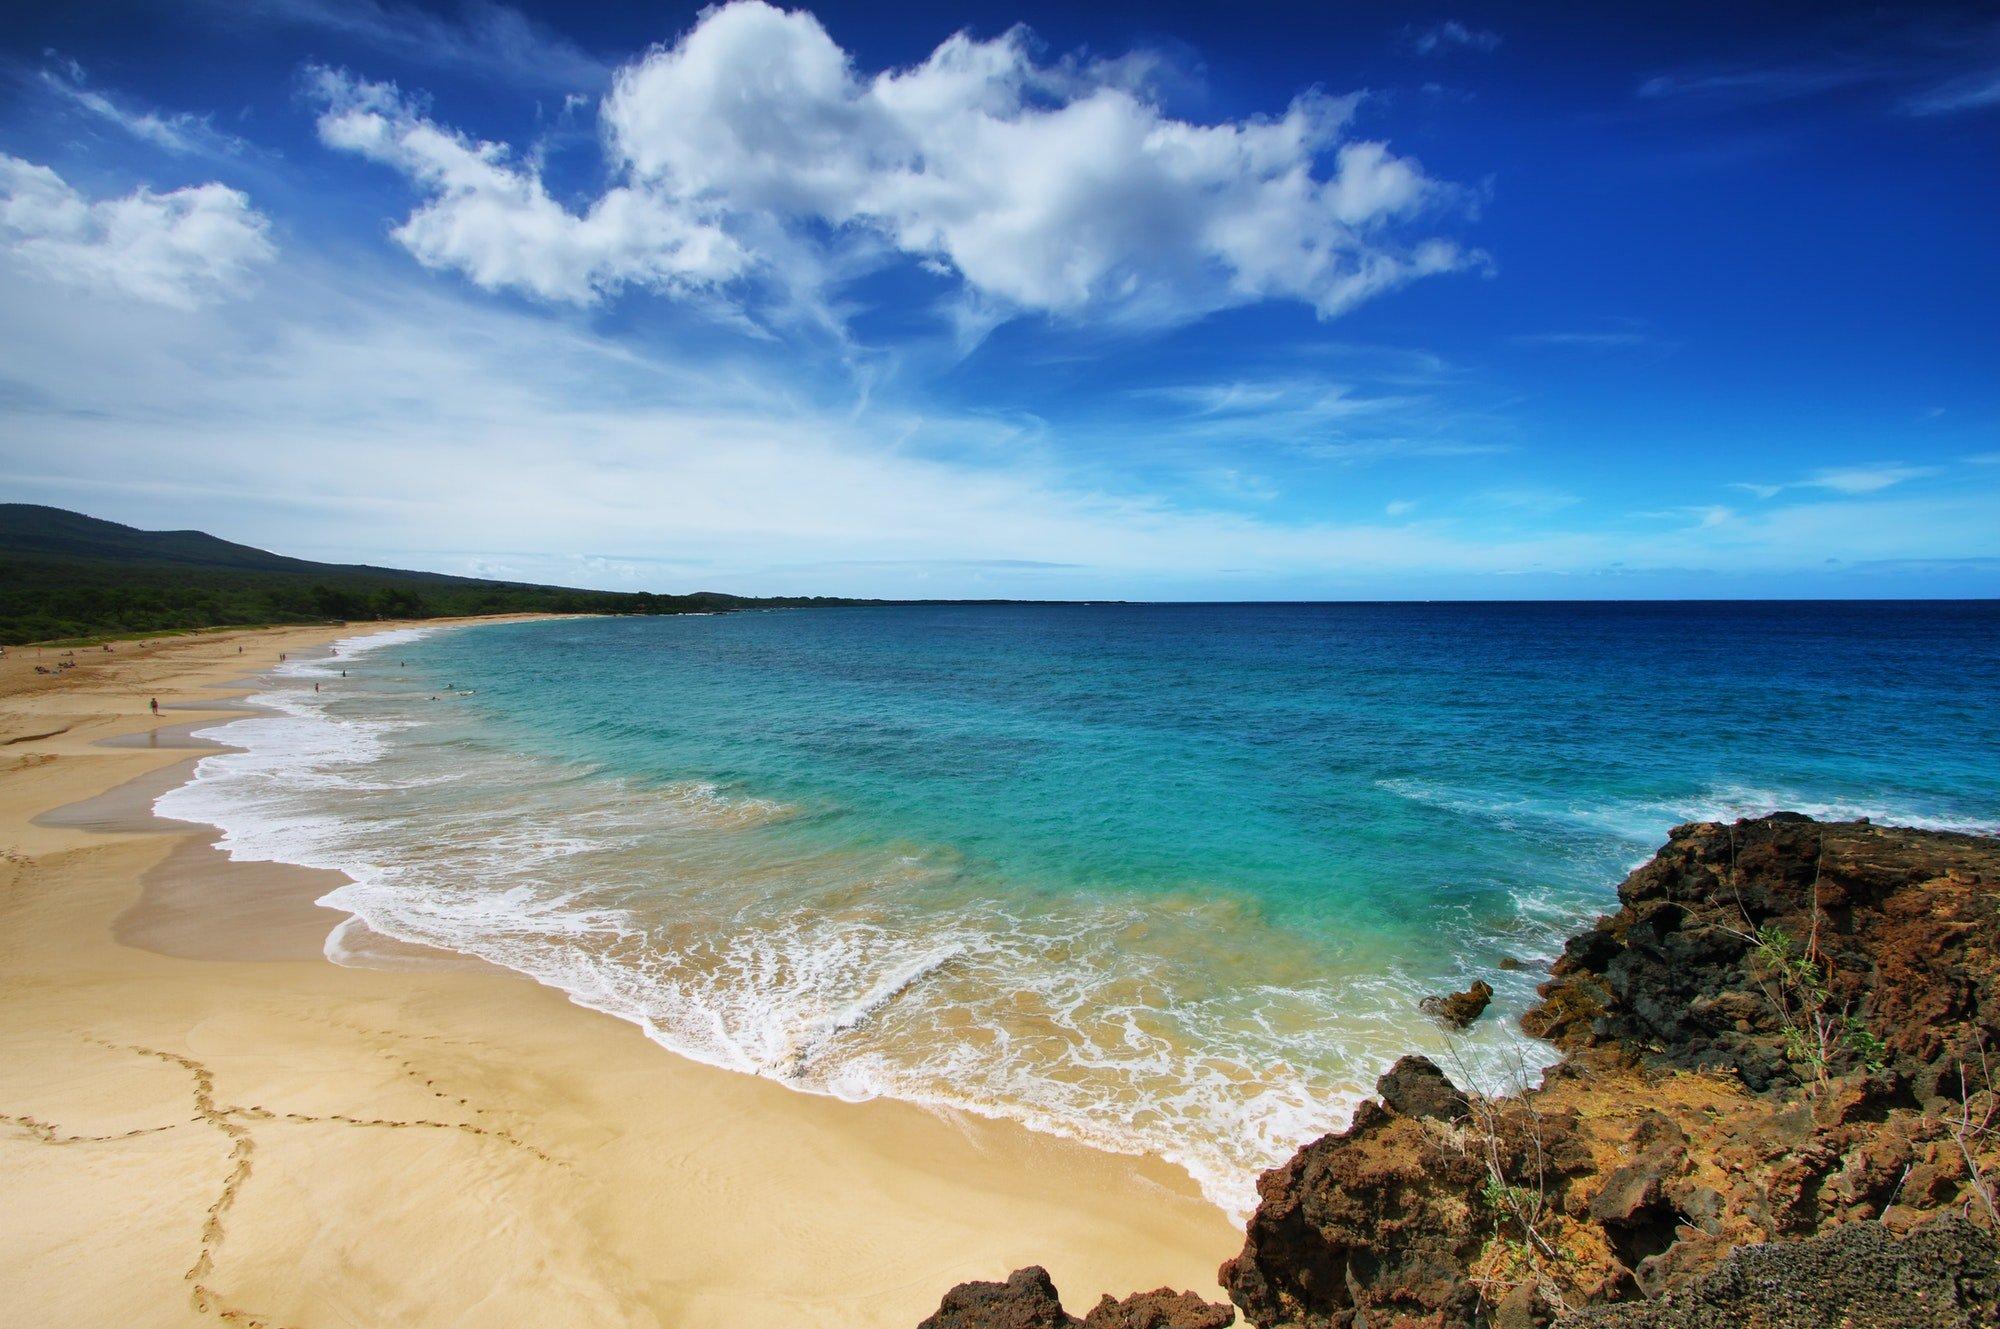 Makena Beach, in Maui, Hawaii